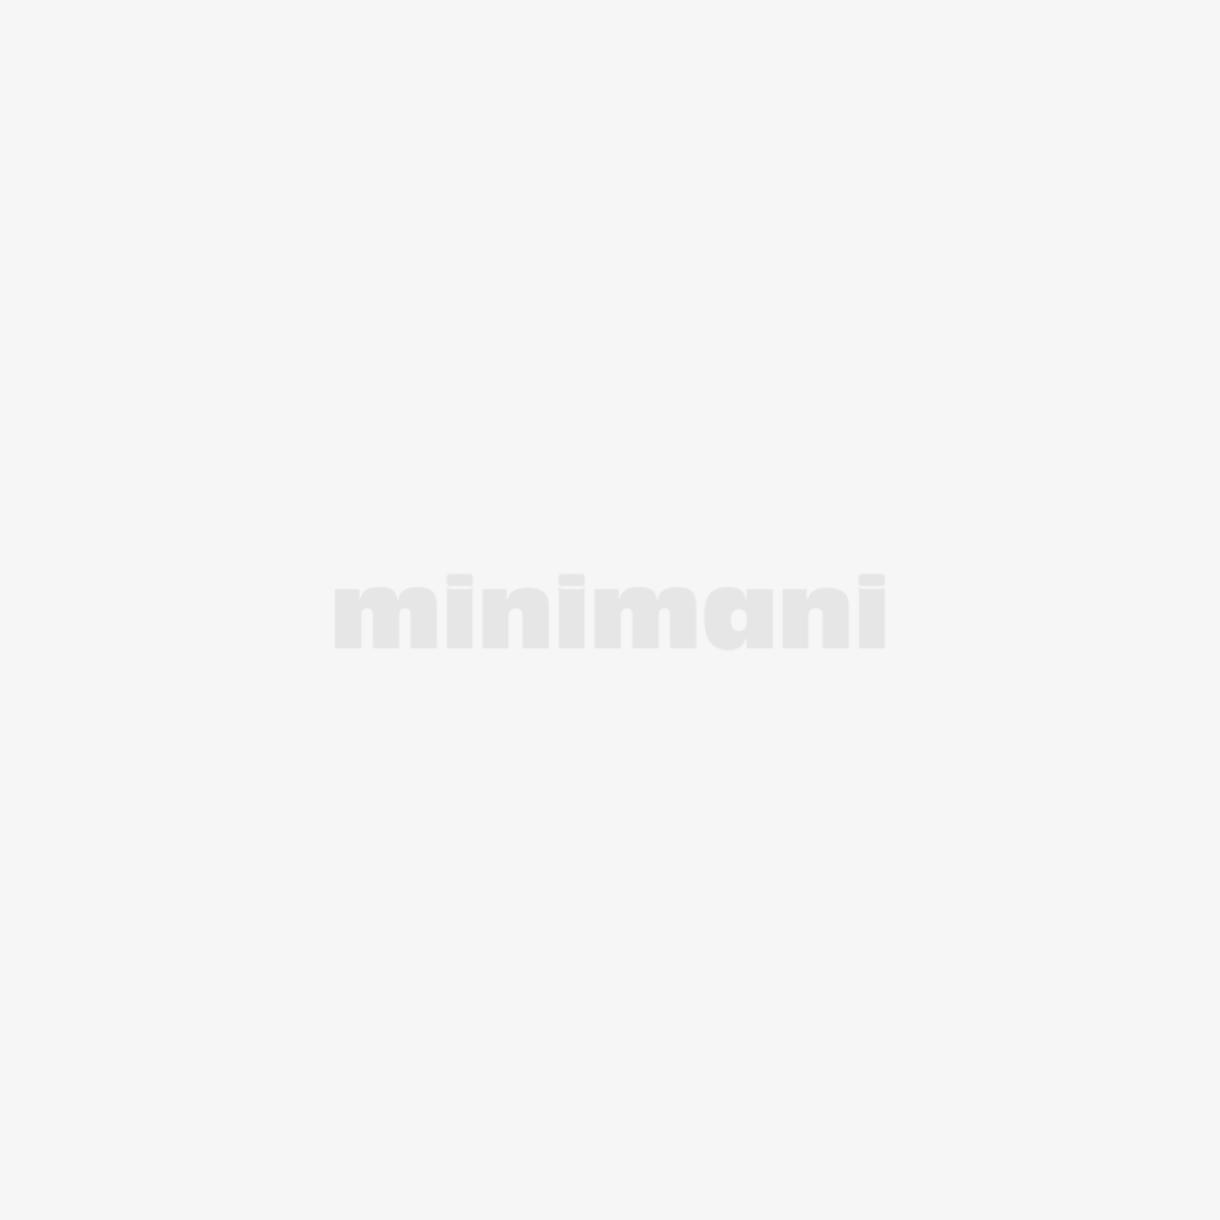 Airam Milja 10 led-lankapallot indico